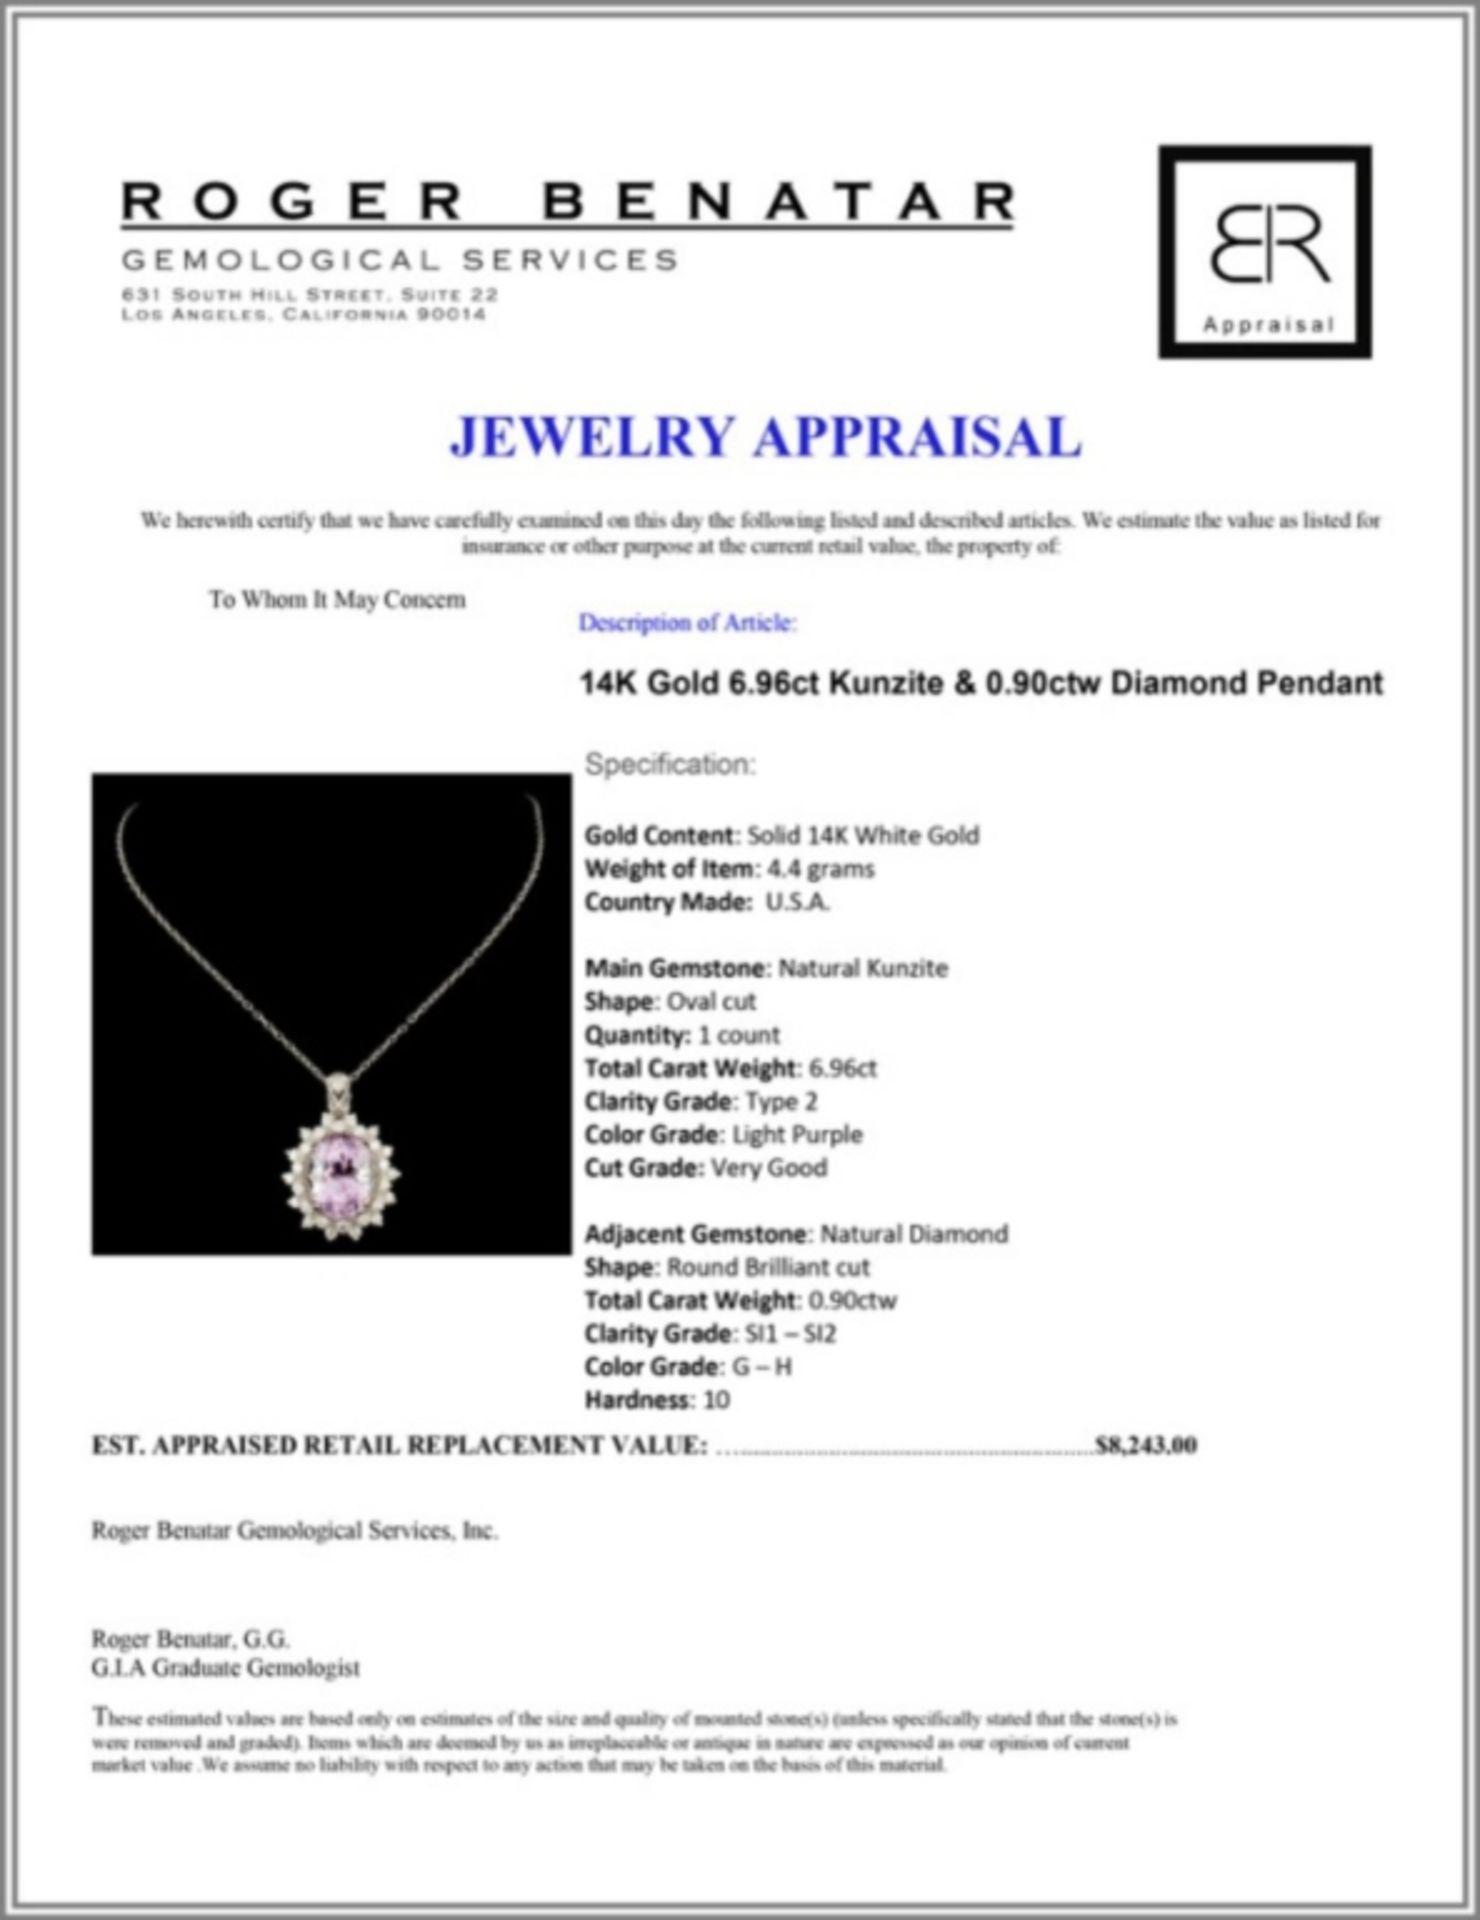 14K Gold 6.96ct Kunzite & 0.90ctw Diamond Pendant - Image 3 of 3